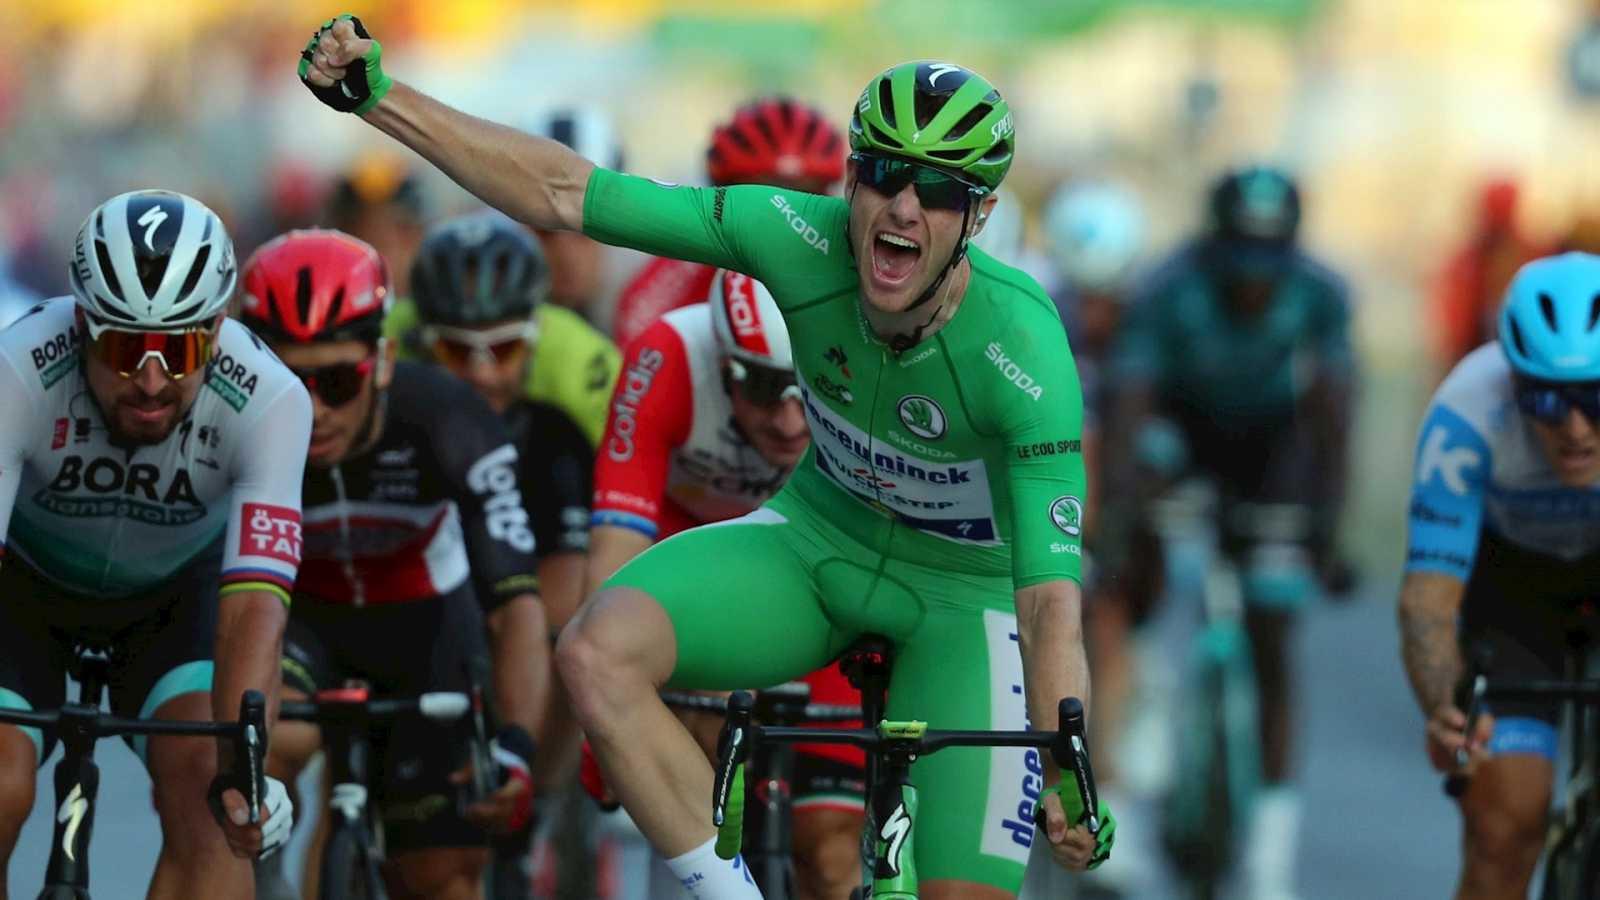 Tour de Francia 2020 - Sam Bennet se hace con la última etapa - Escuchar ahora